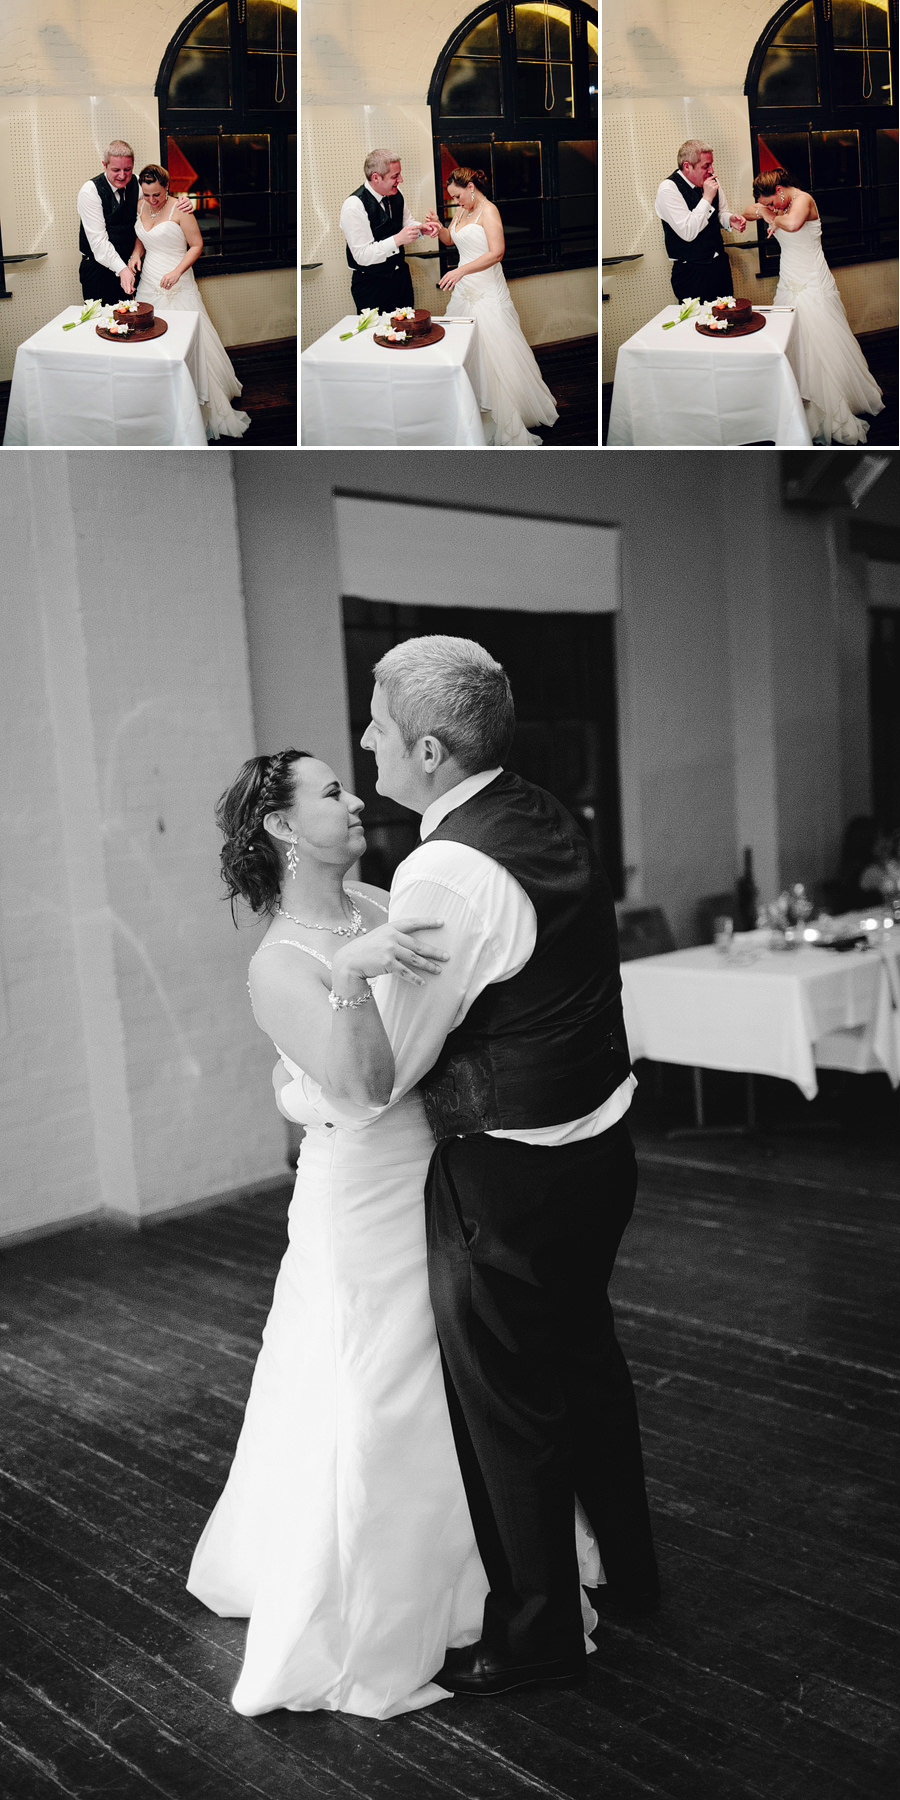 Fun Wedding Photographer: Bridal waltz